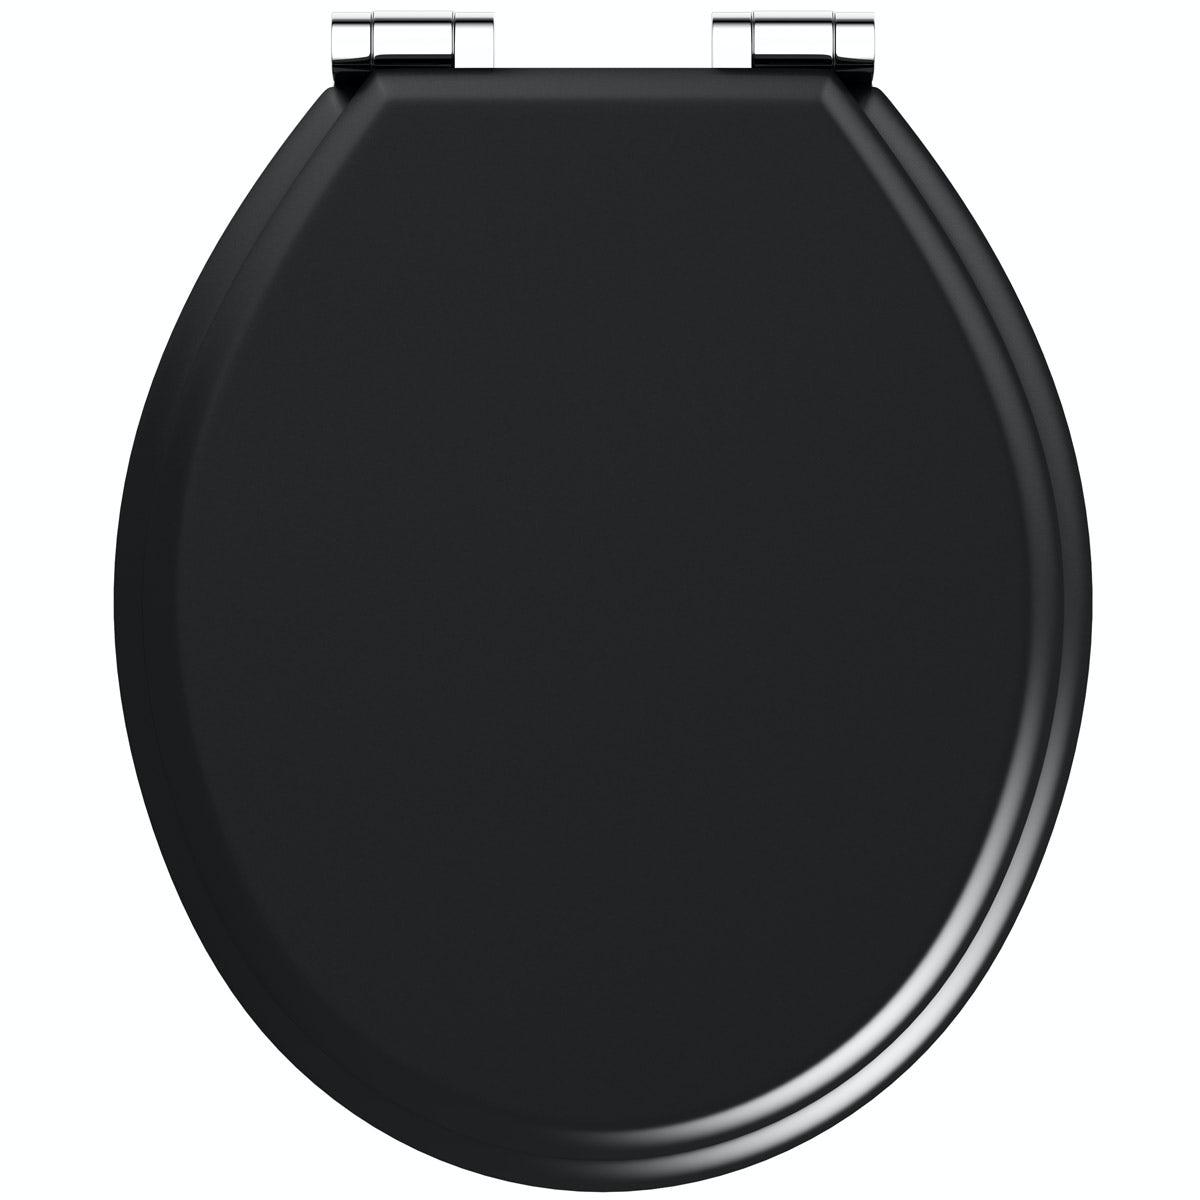 Universal Matte Black Soft Close Toilet Seat Victoriaplum Com